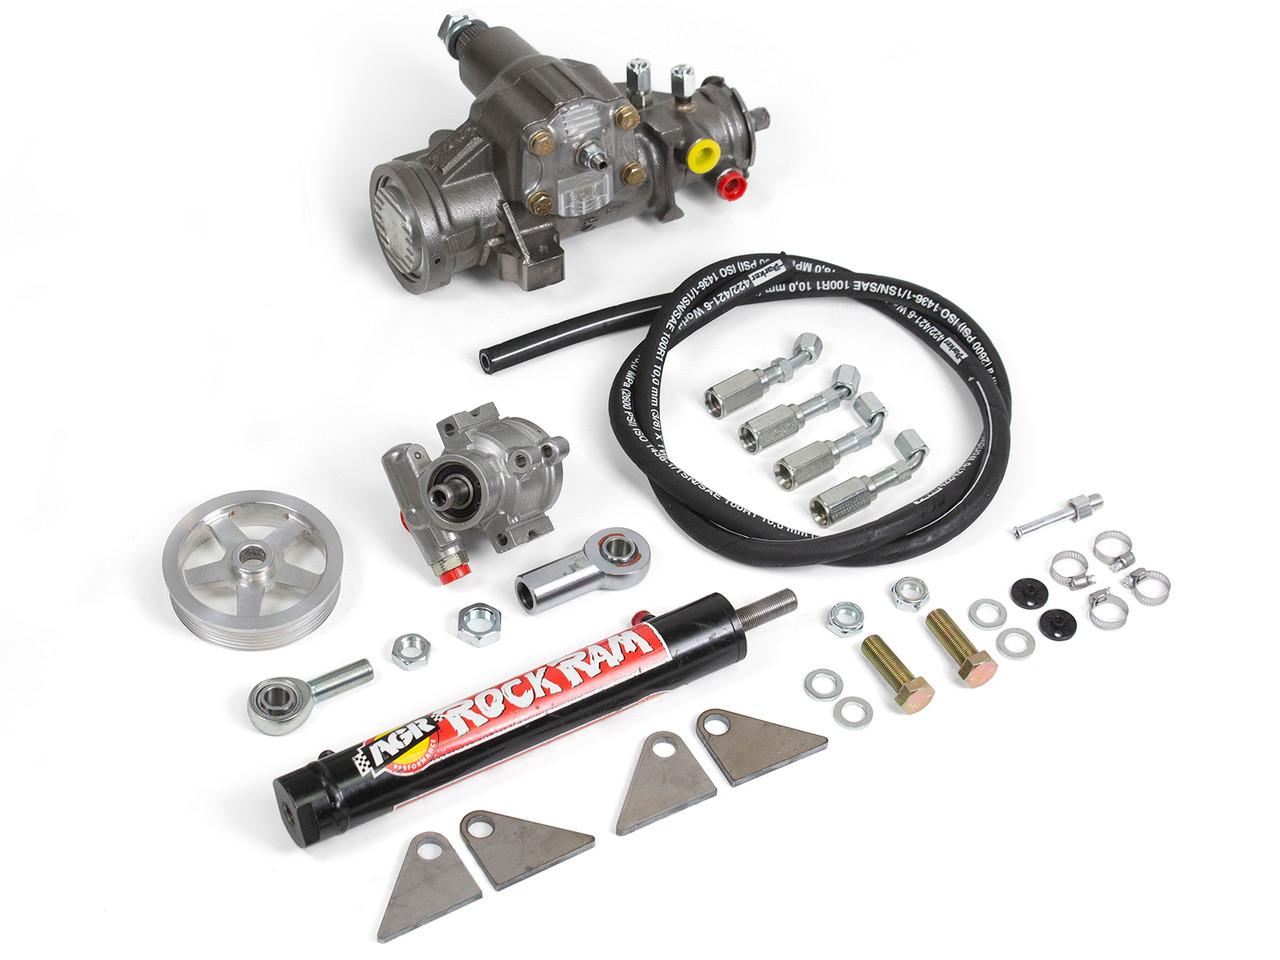 AGR Jeep Rock Ram Steering System 97-02 Jeep TJ 4.0L